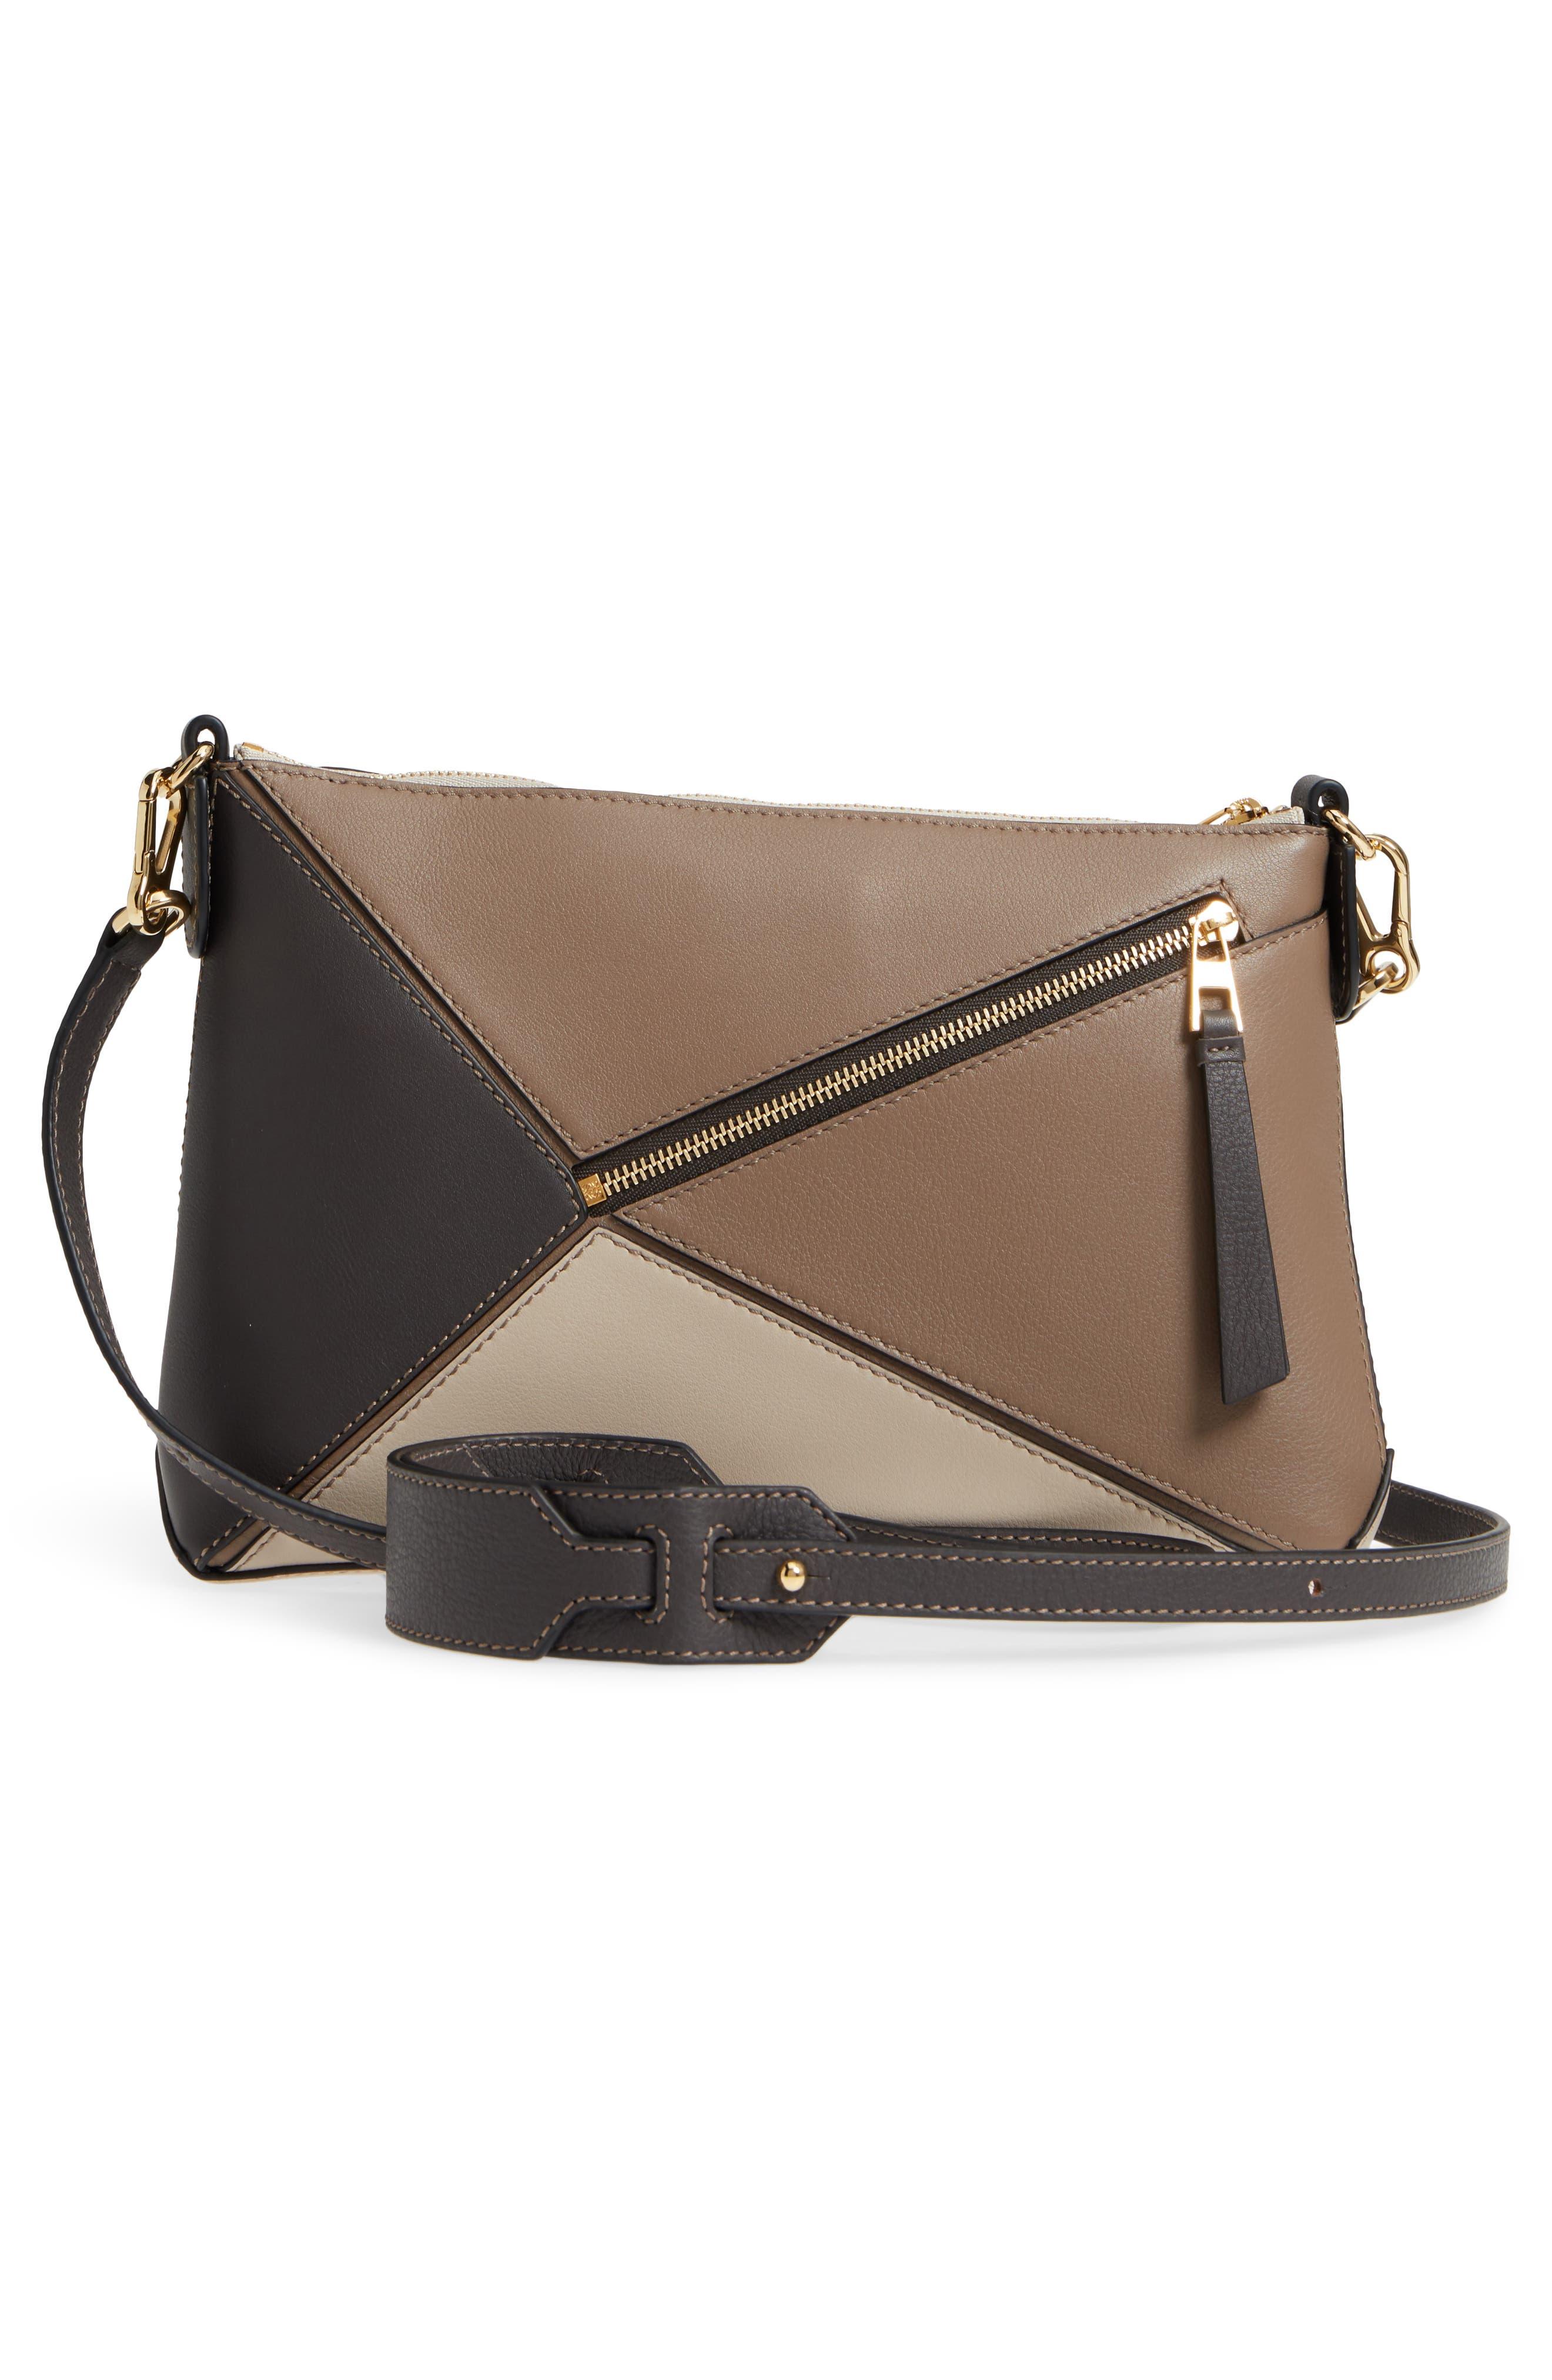 Mini Puzzle Calfskin Leather Crossbody Bag,                             Alternate thumbnail 3, color,                             DARK TAUPE MULTITONE